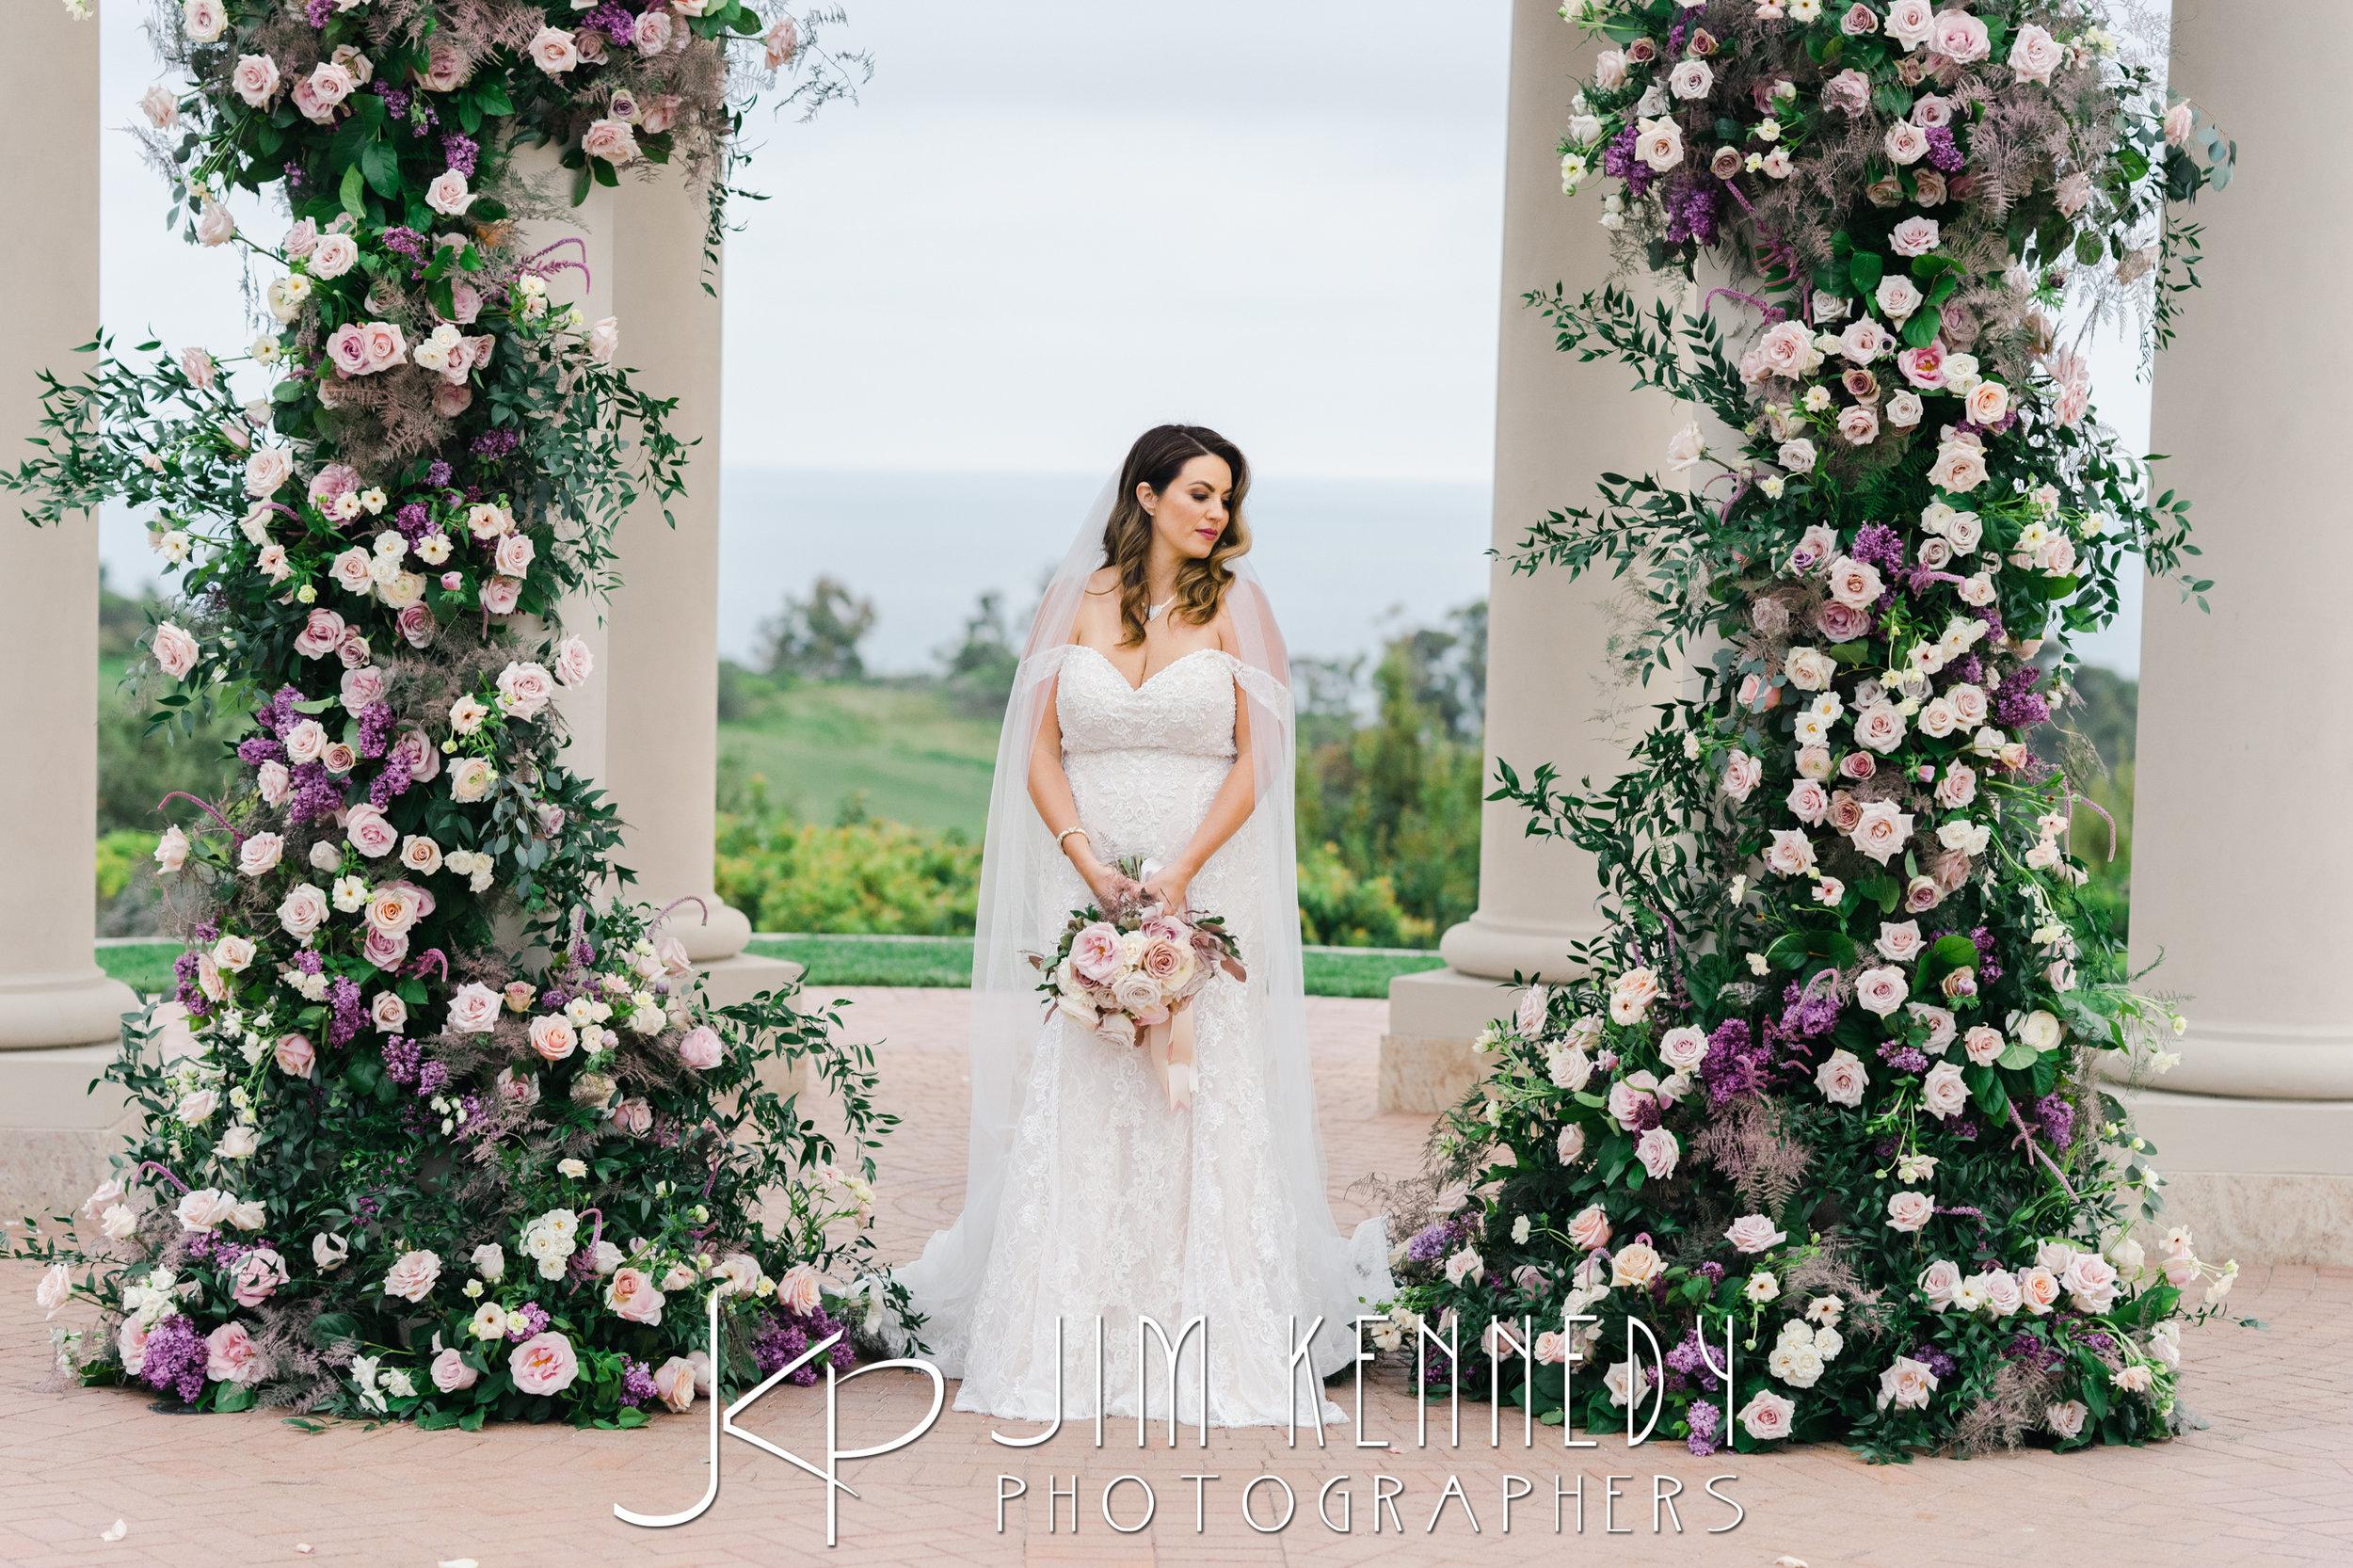 pelican-hill-wedding-jim-kenedy-photographers_0161.JPG